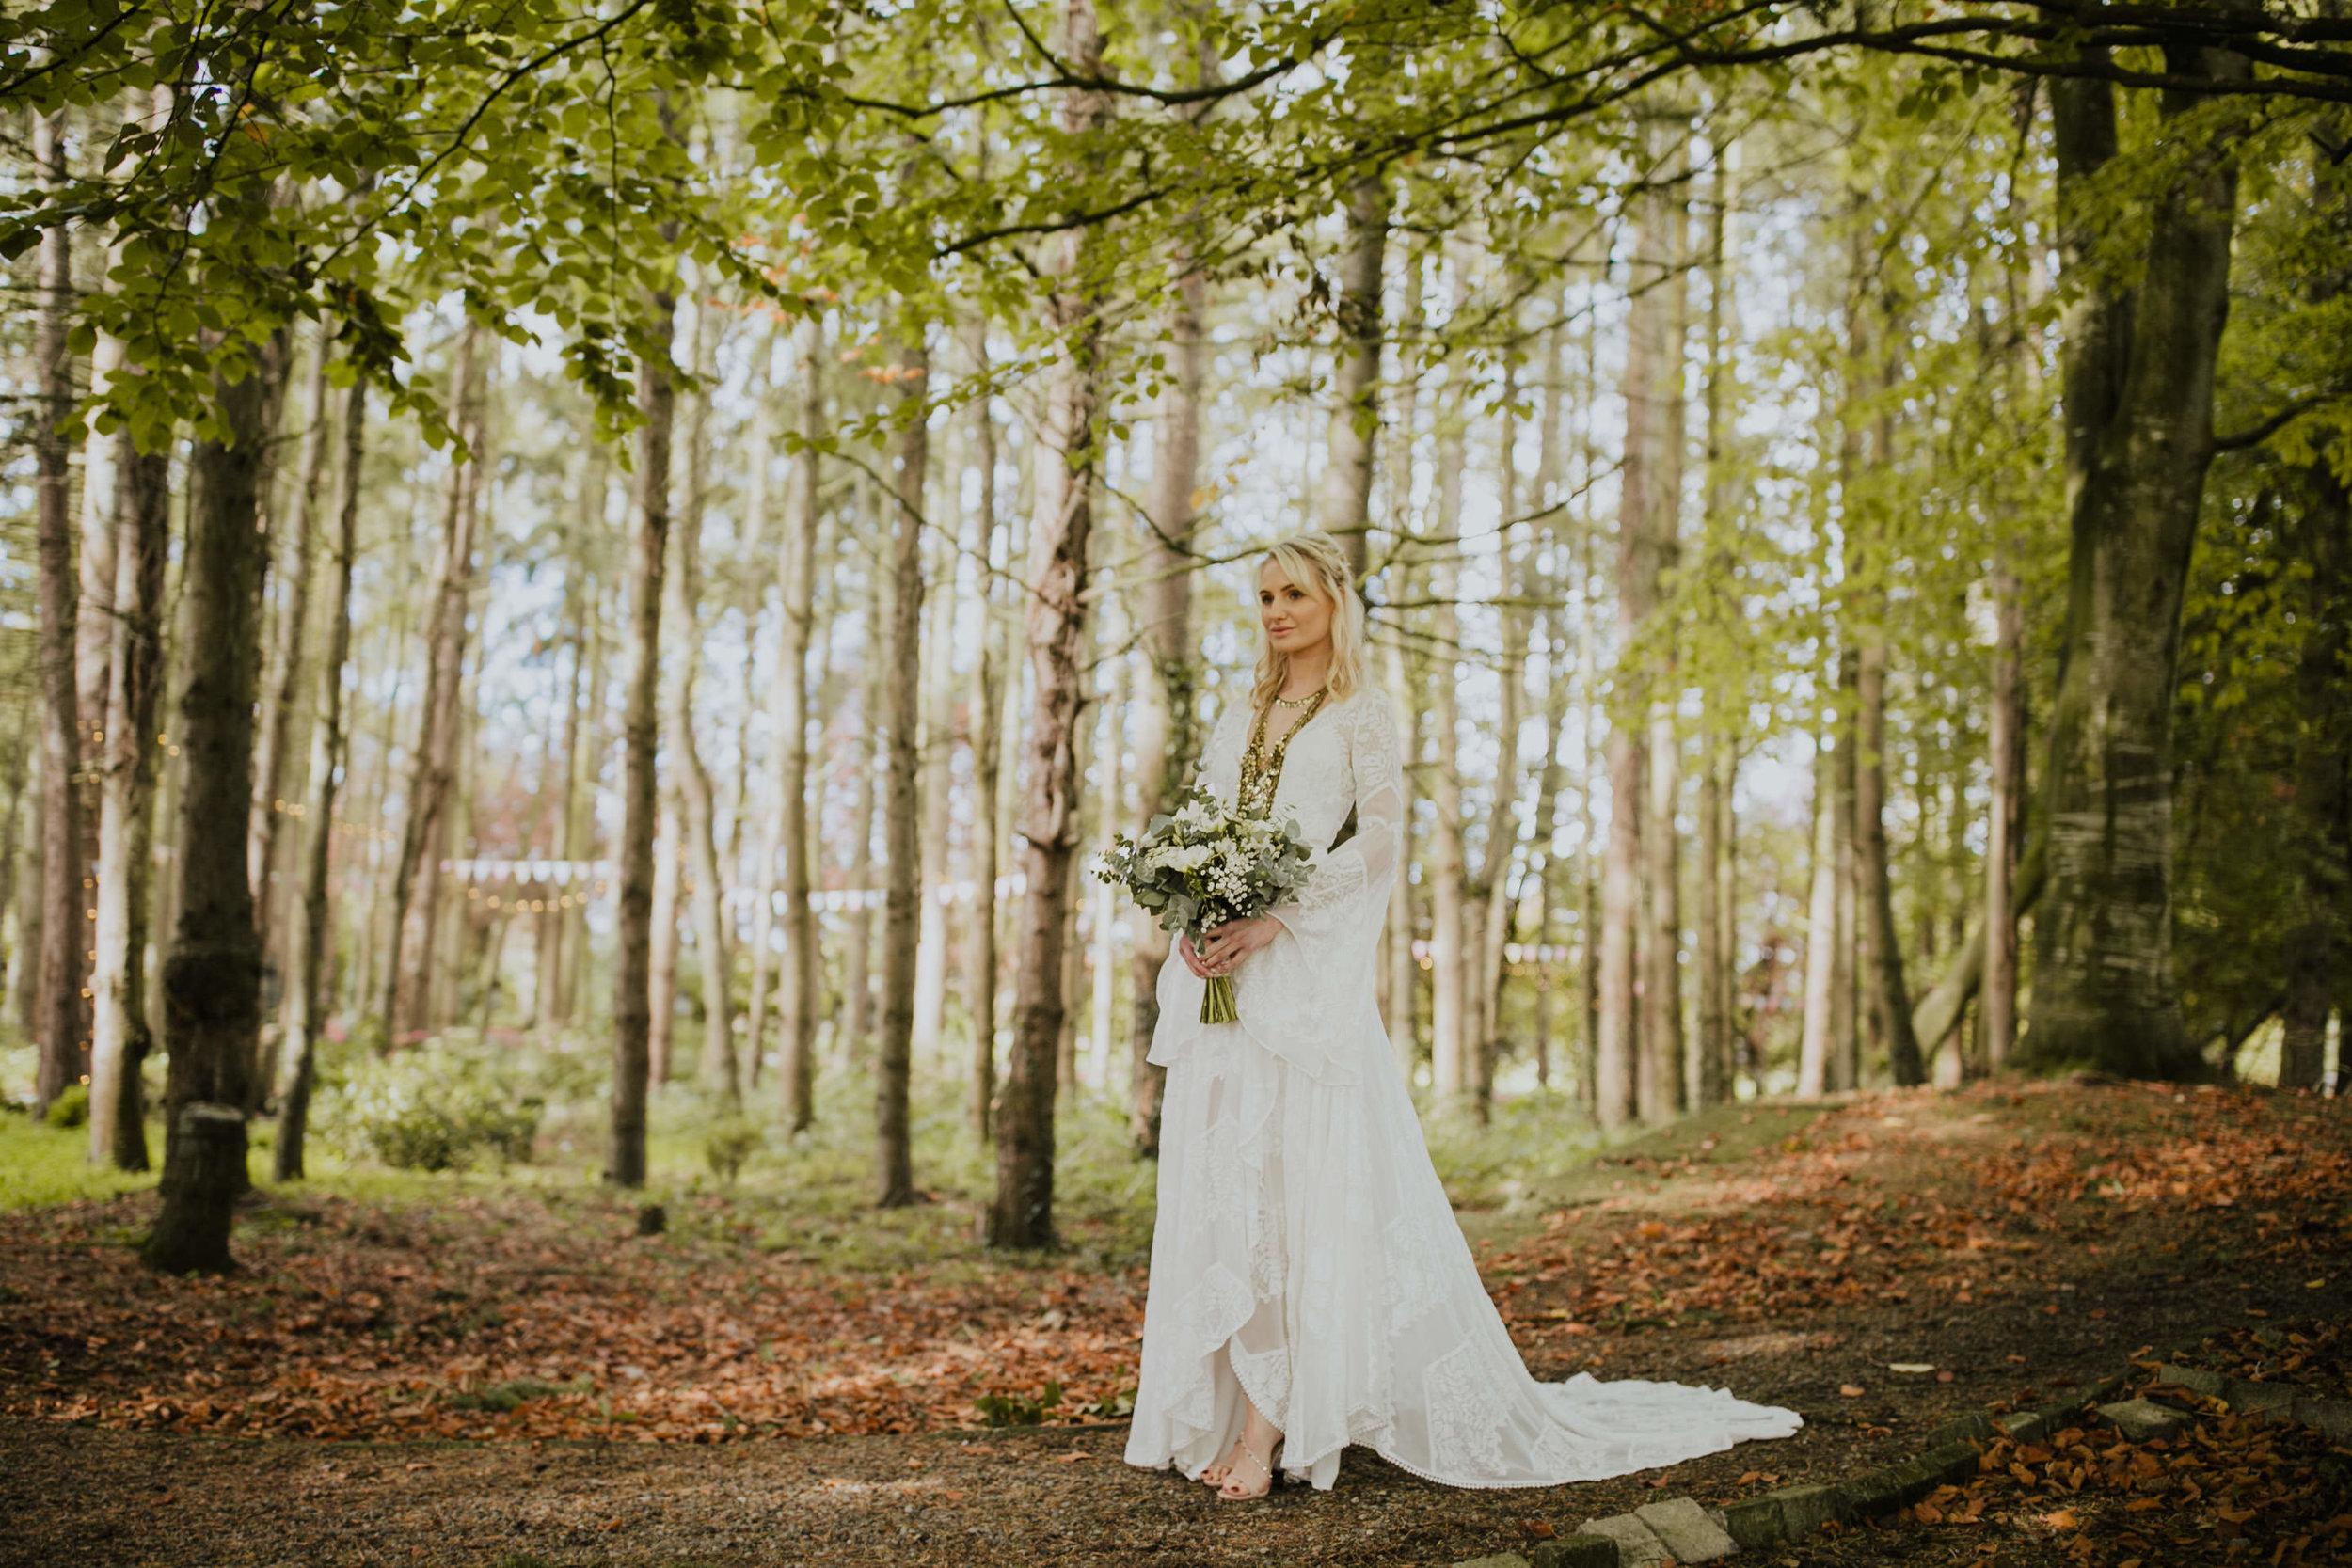 boho_wedding_alpaca_xpose_station_house_livia_figueiredo_photography_28.jpg